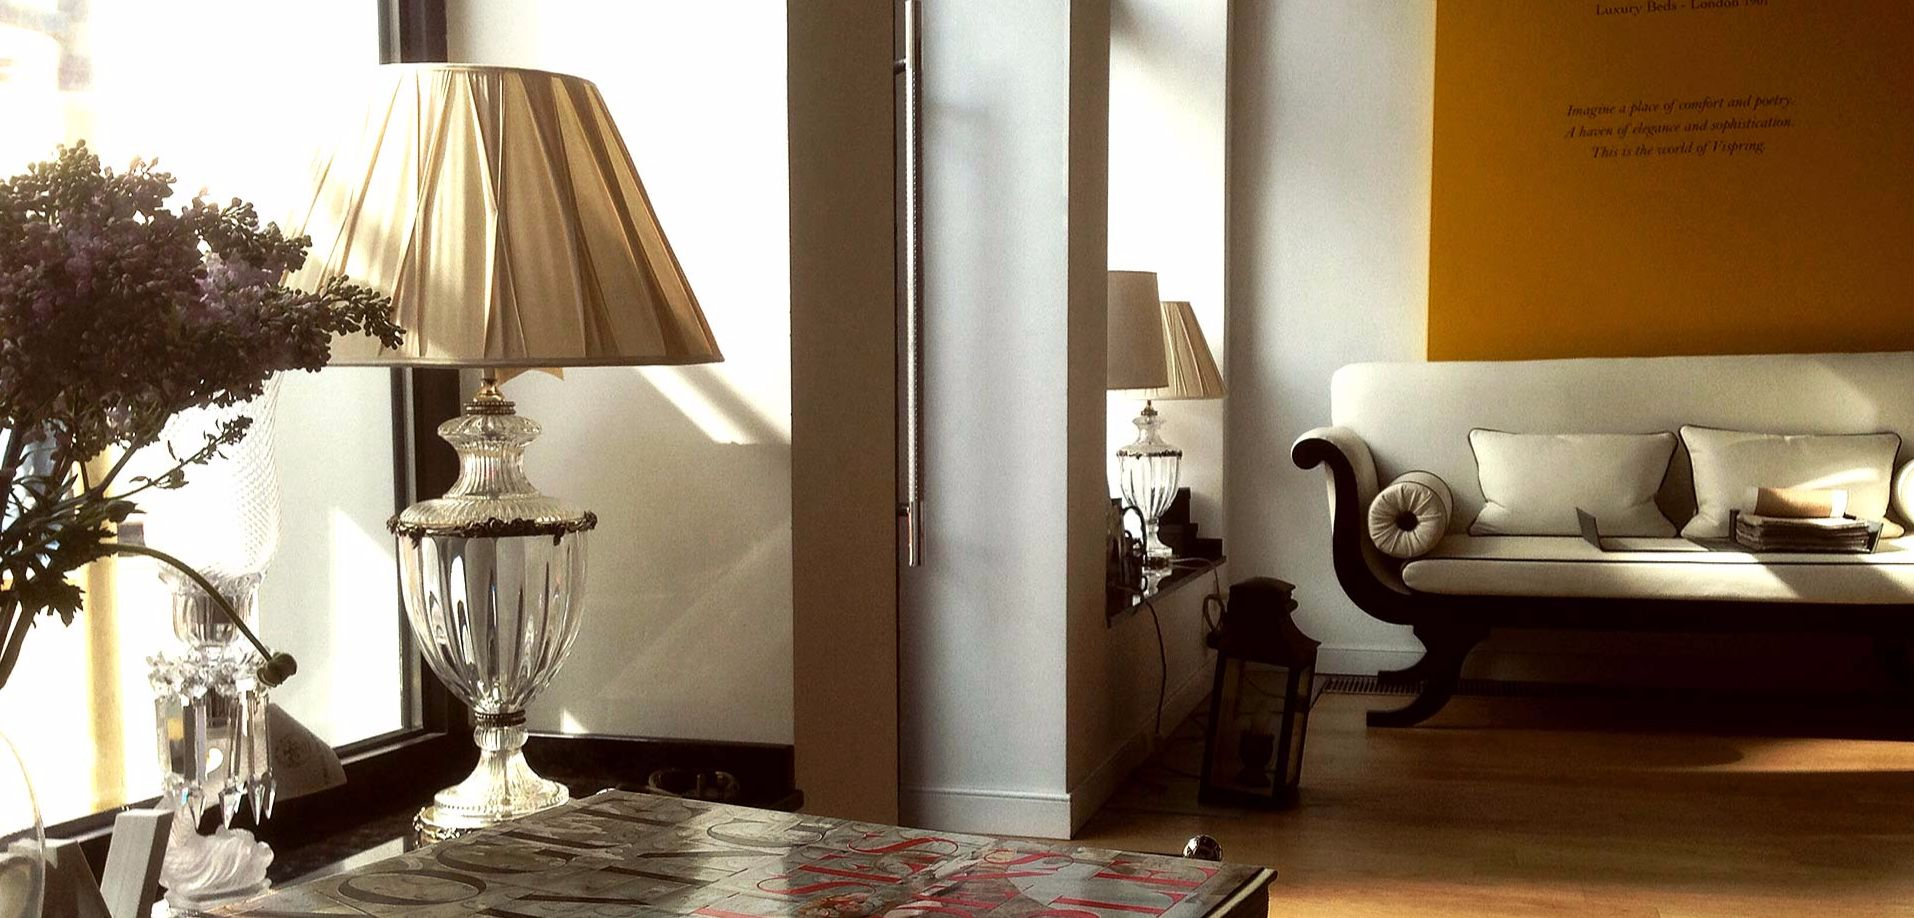 Interior Design By: Rosbri